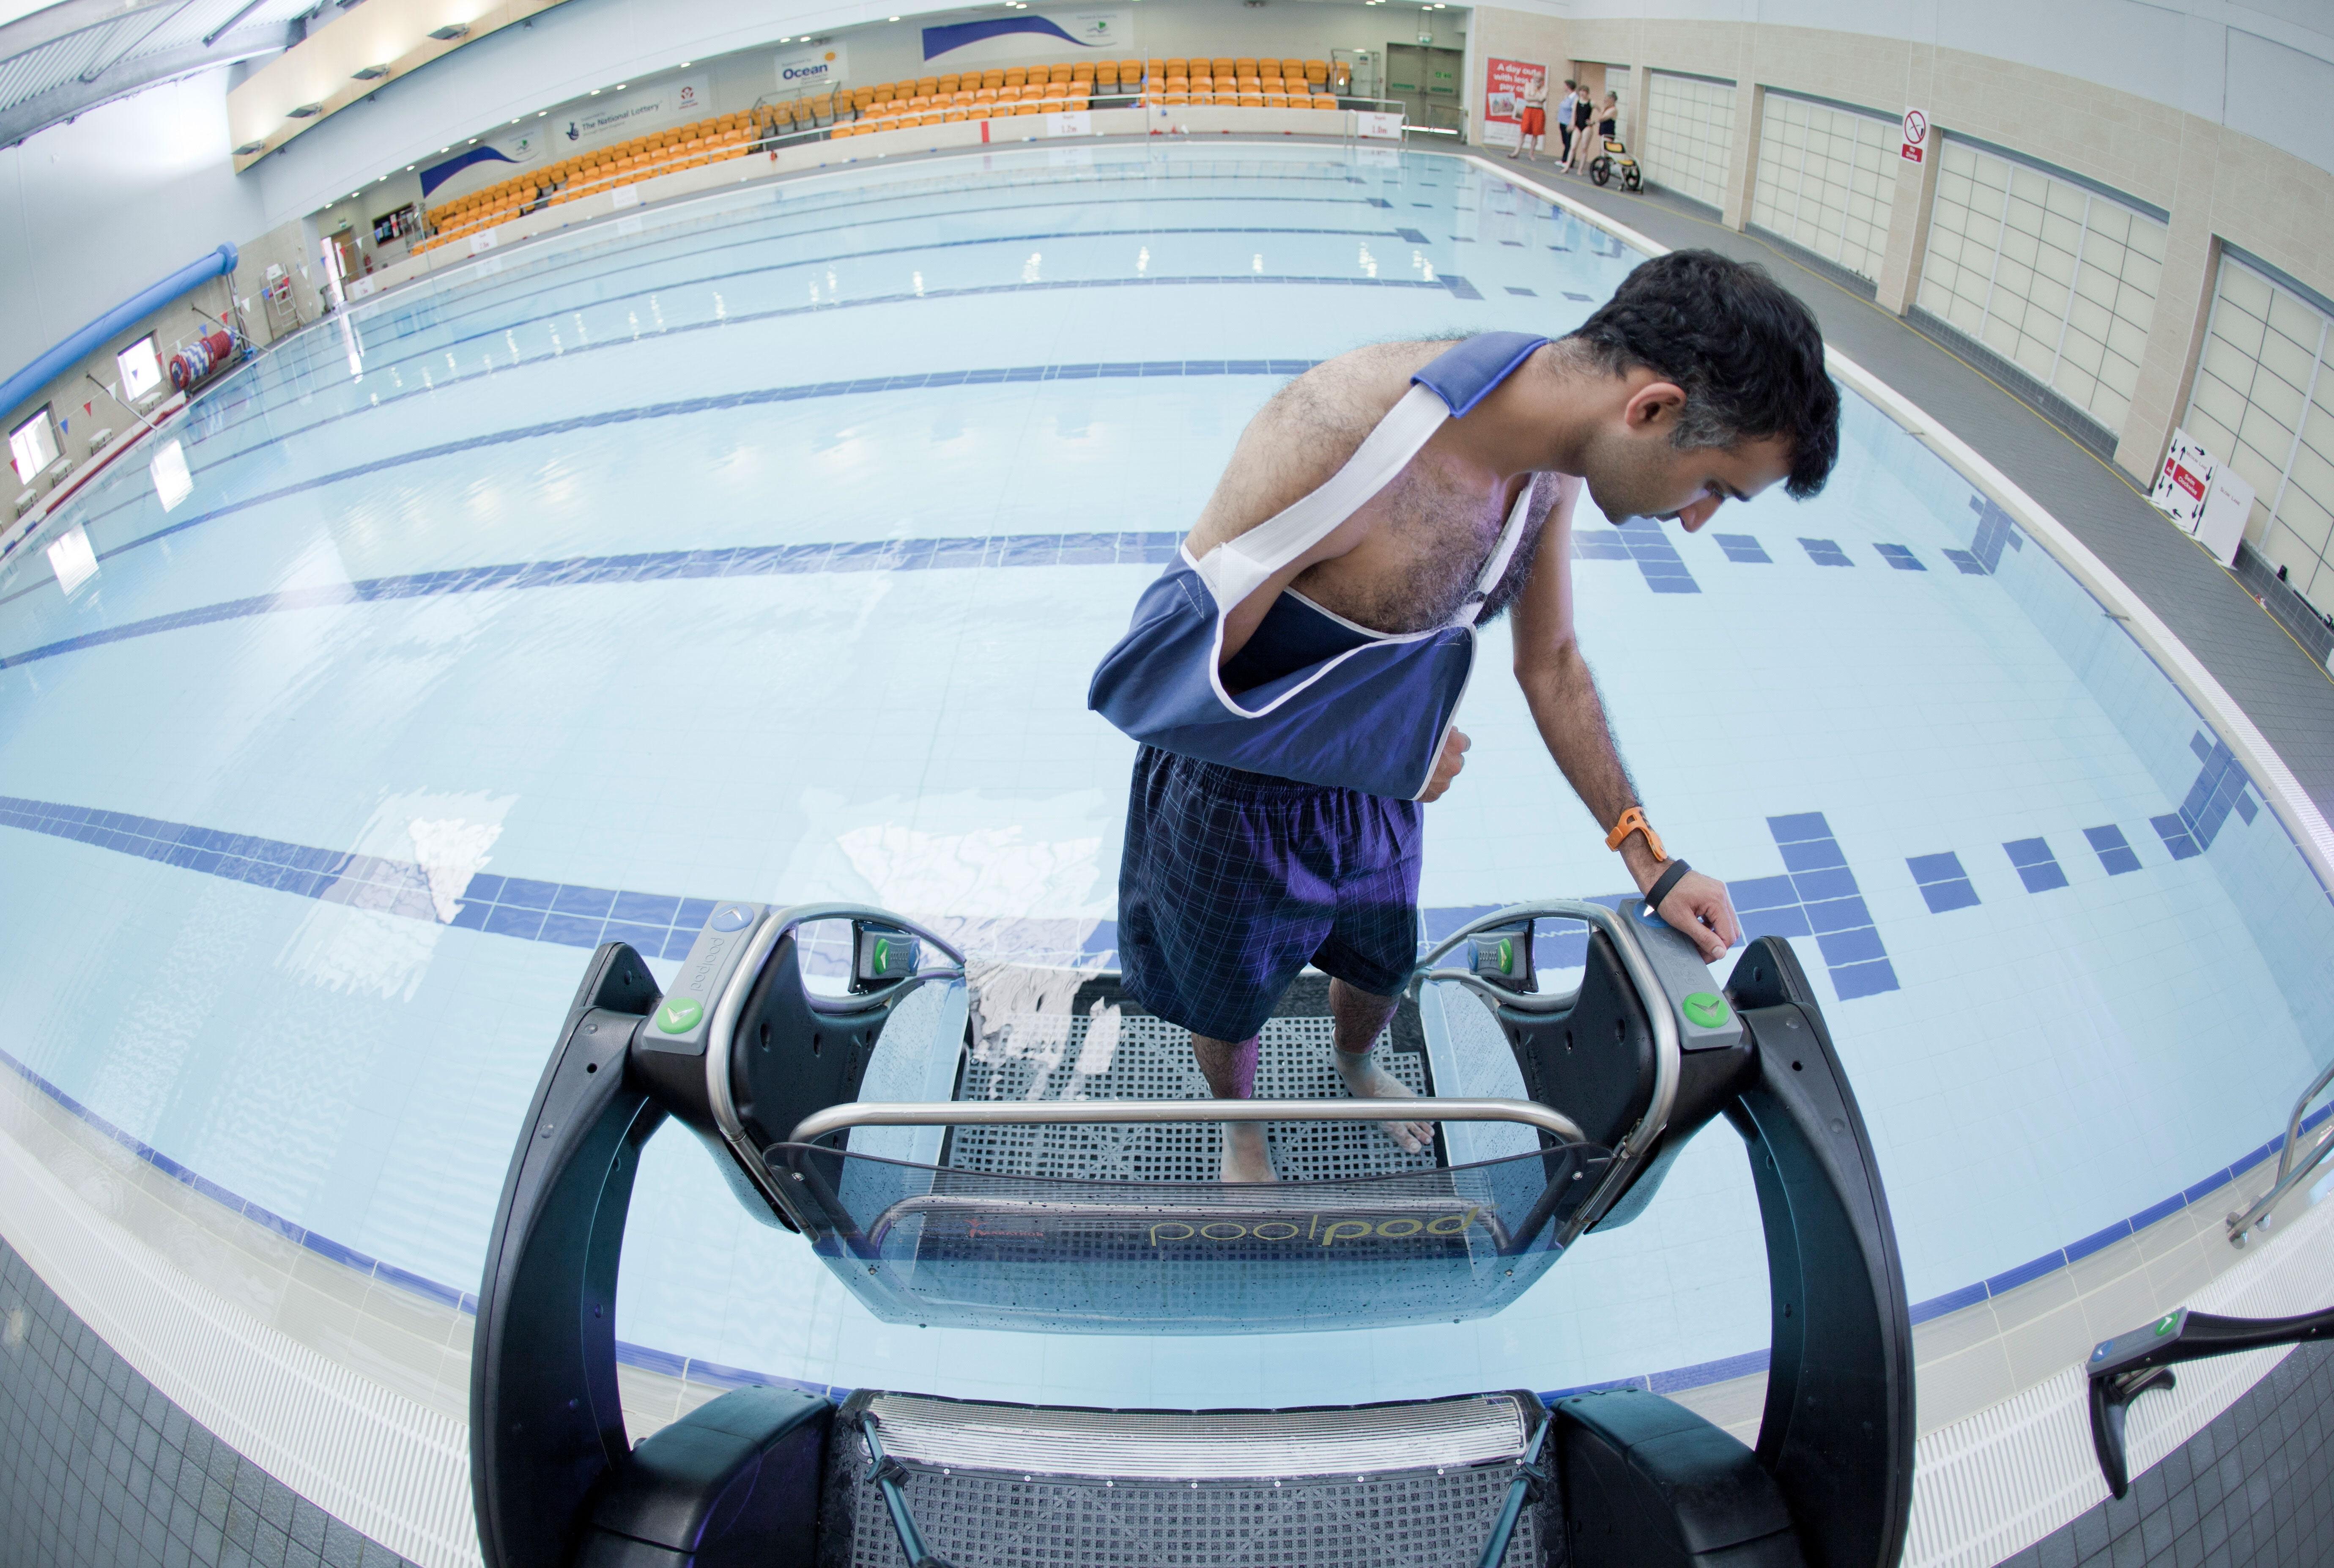 Man using Poolpod to access pool